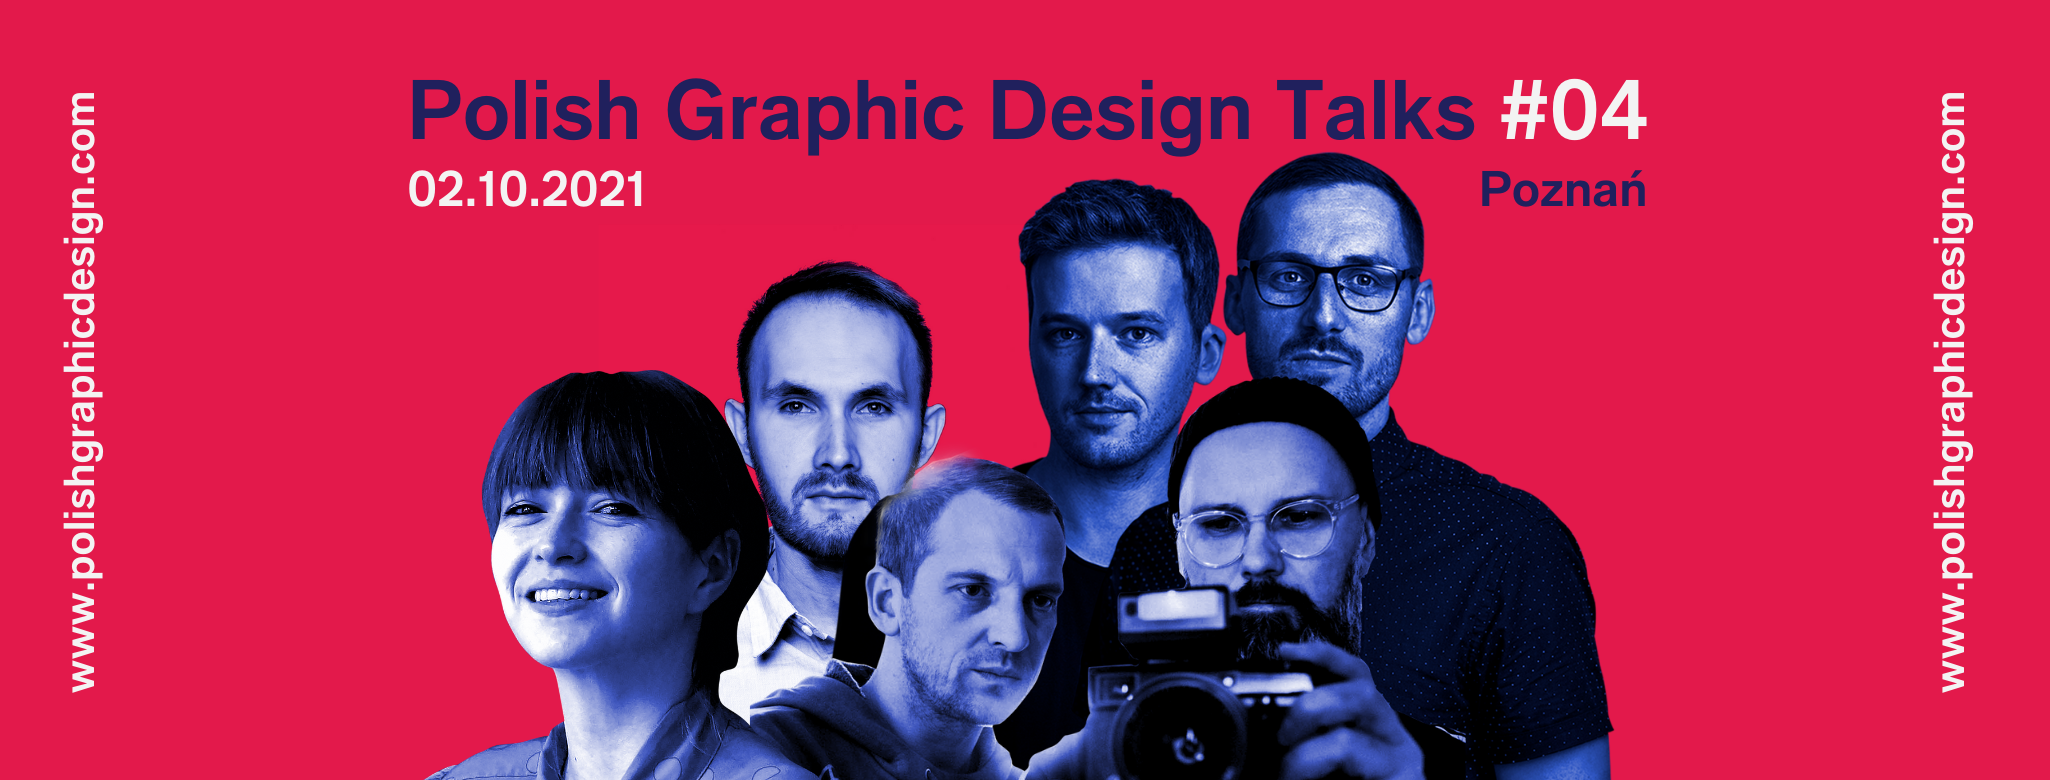 Polish Graphic Design Talks #04